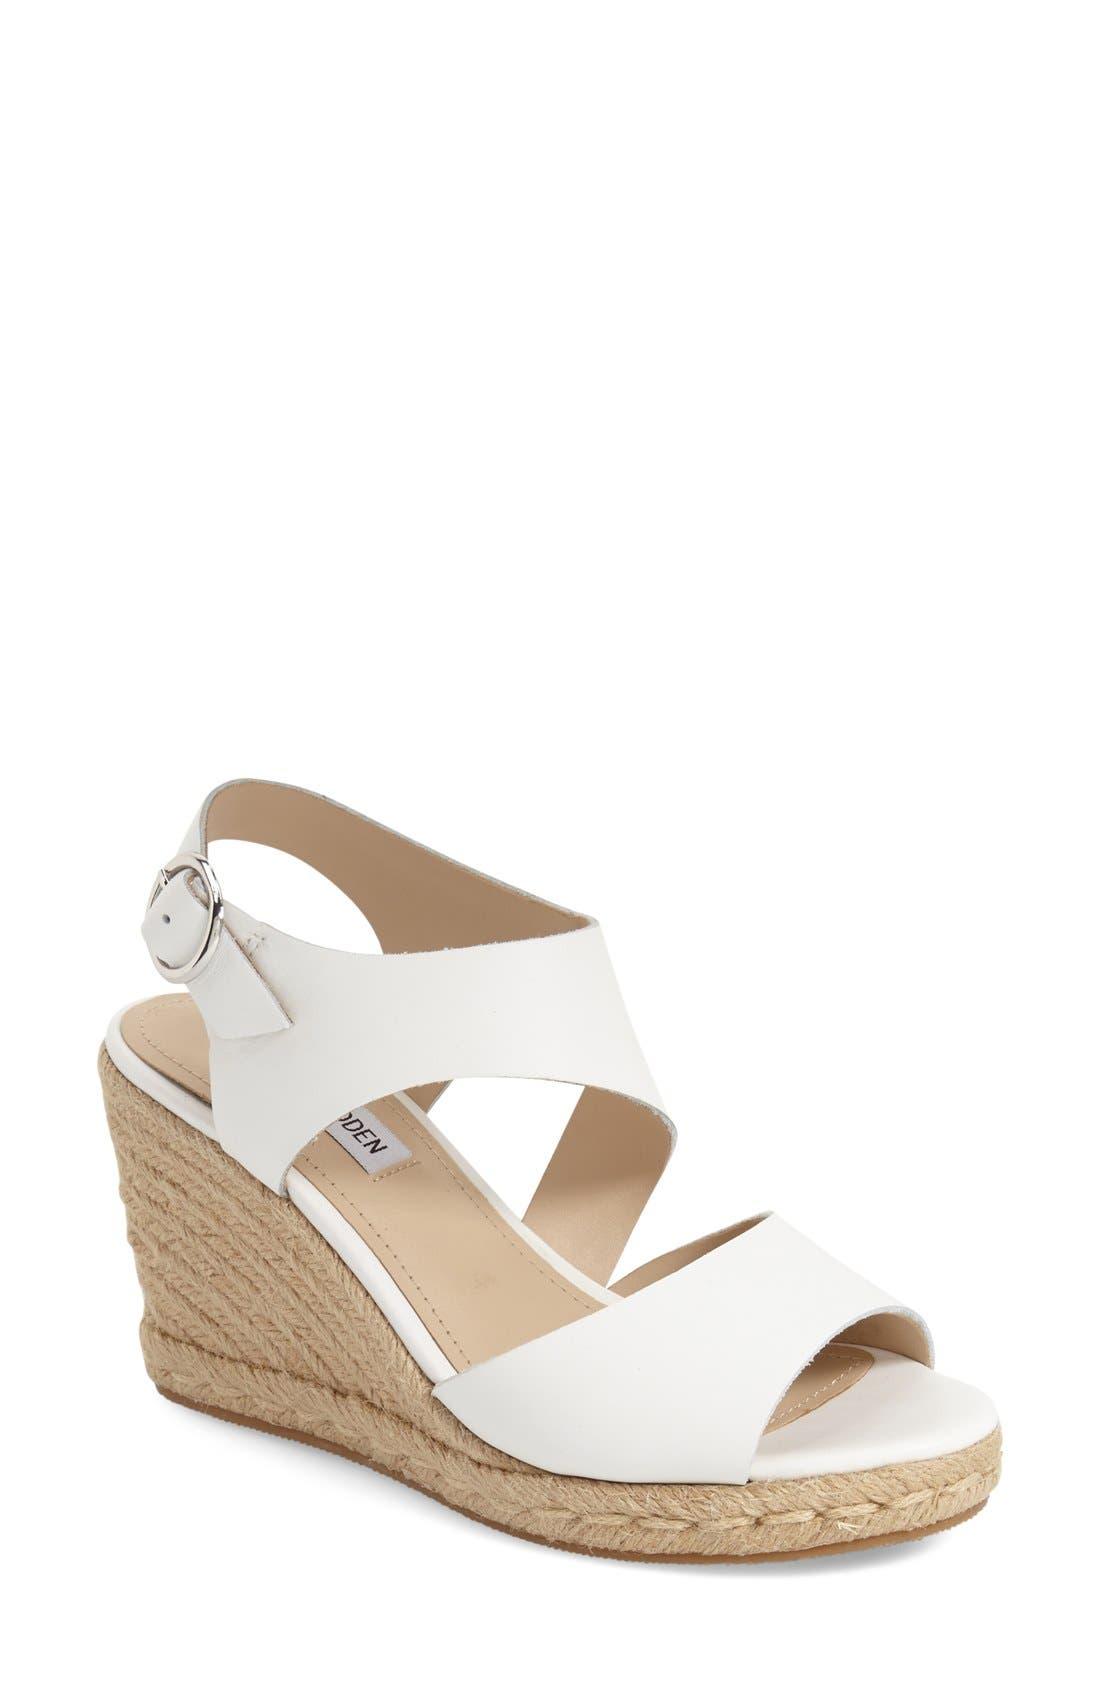 'Wavi' Espadrille Wedge Sandal,                         Main,                         color, White Leather